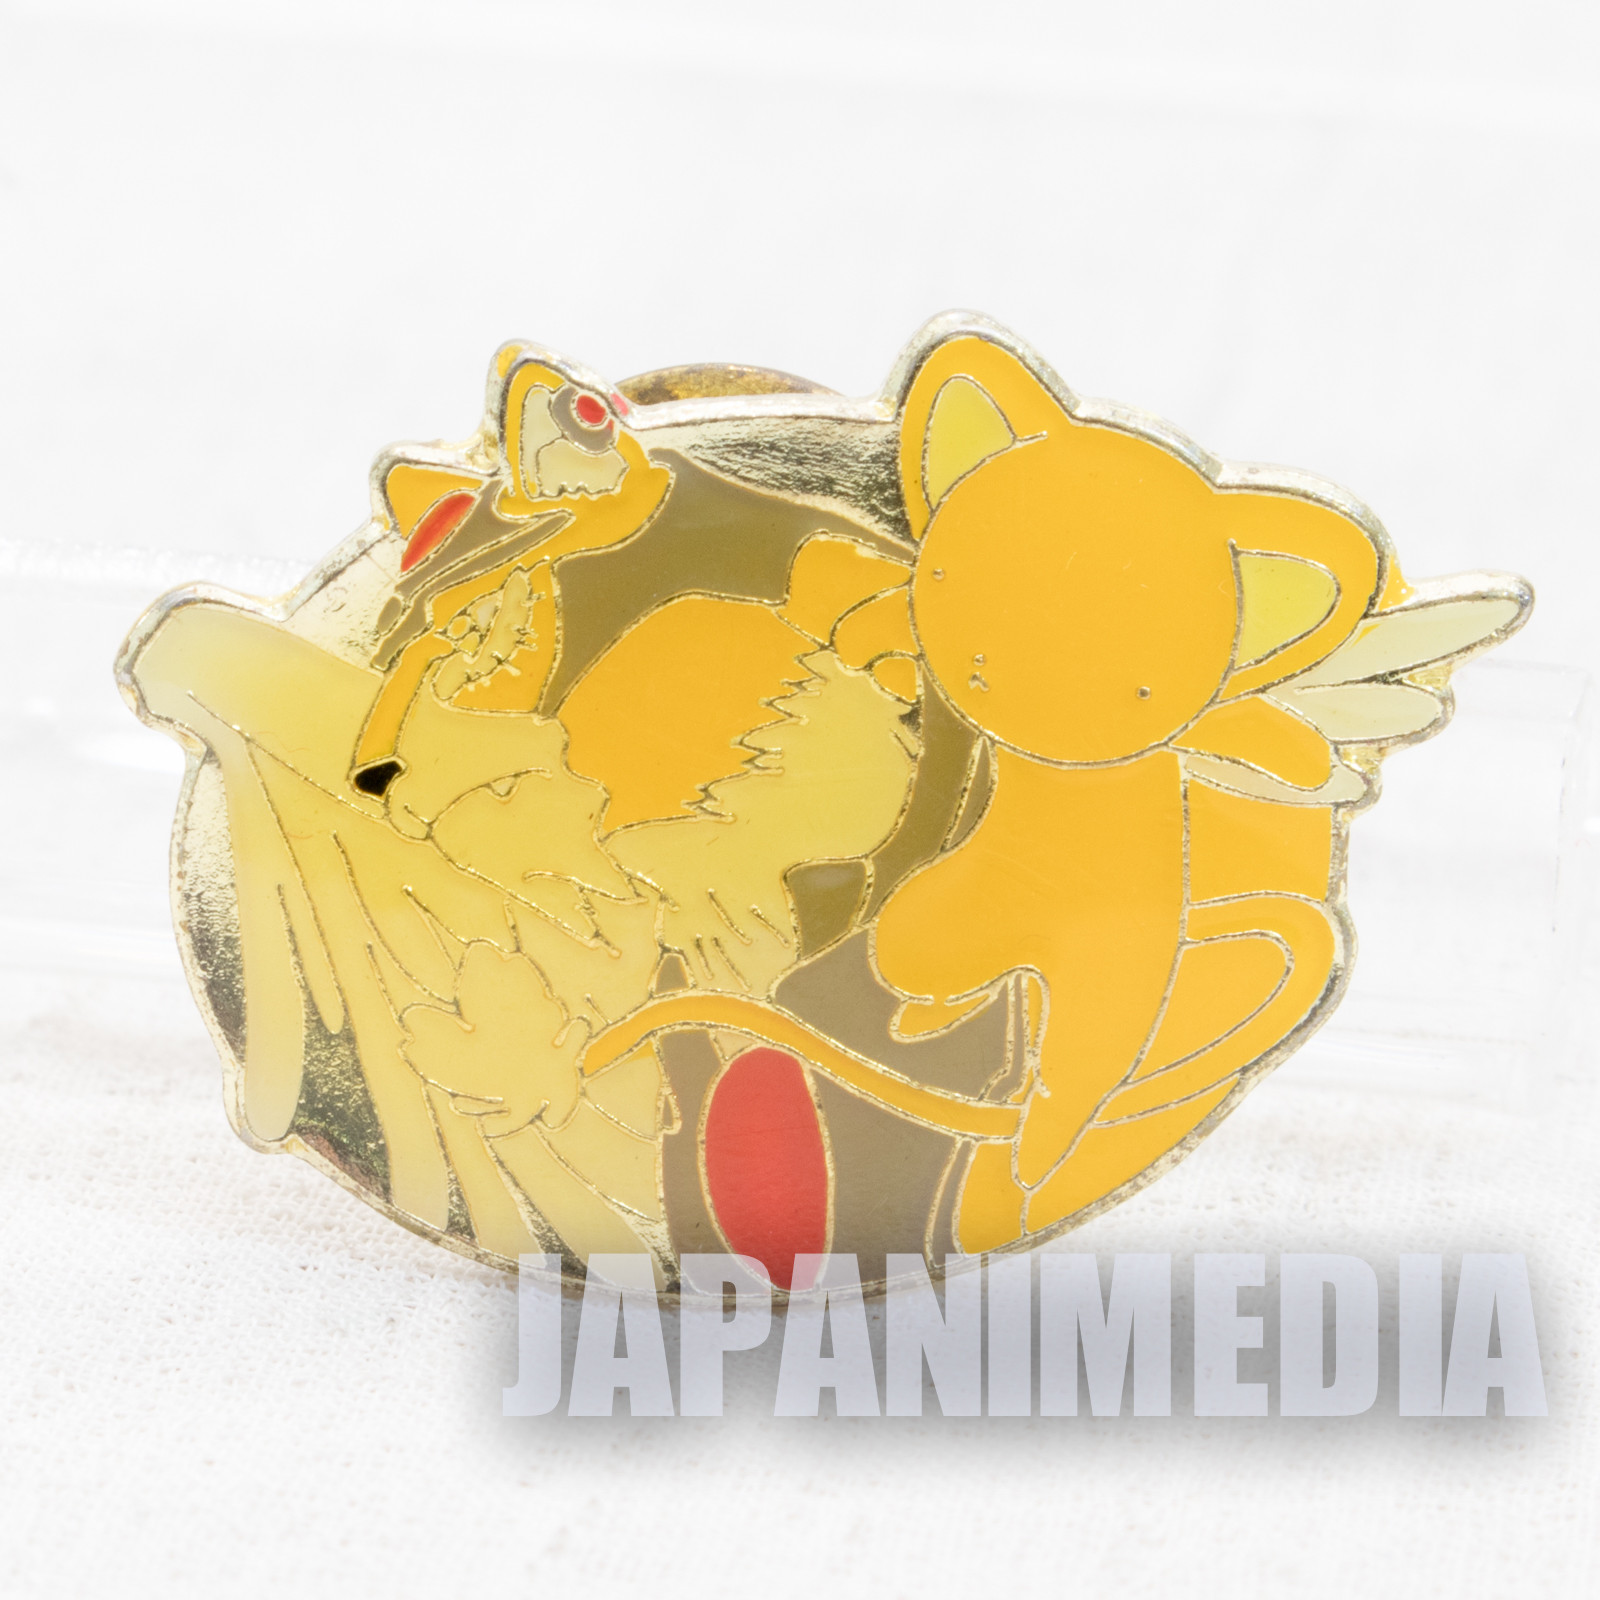 Cardcaptor Sakura Cerberus & Kero-chan Sakura Pins CLAMP JAPAN ANIME #16